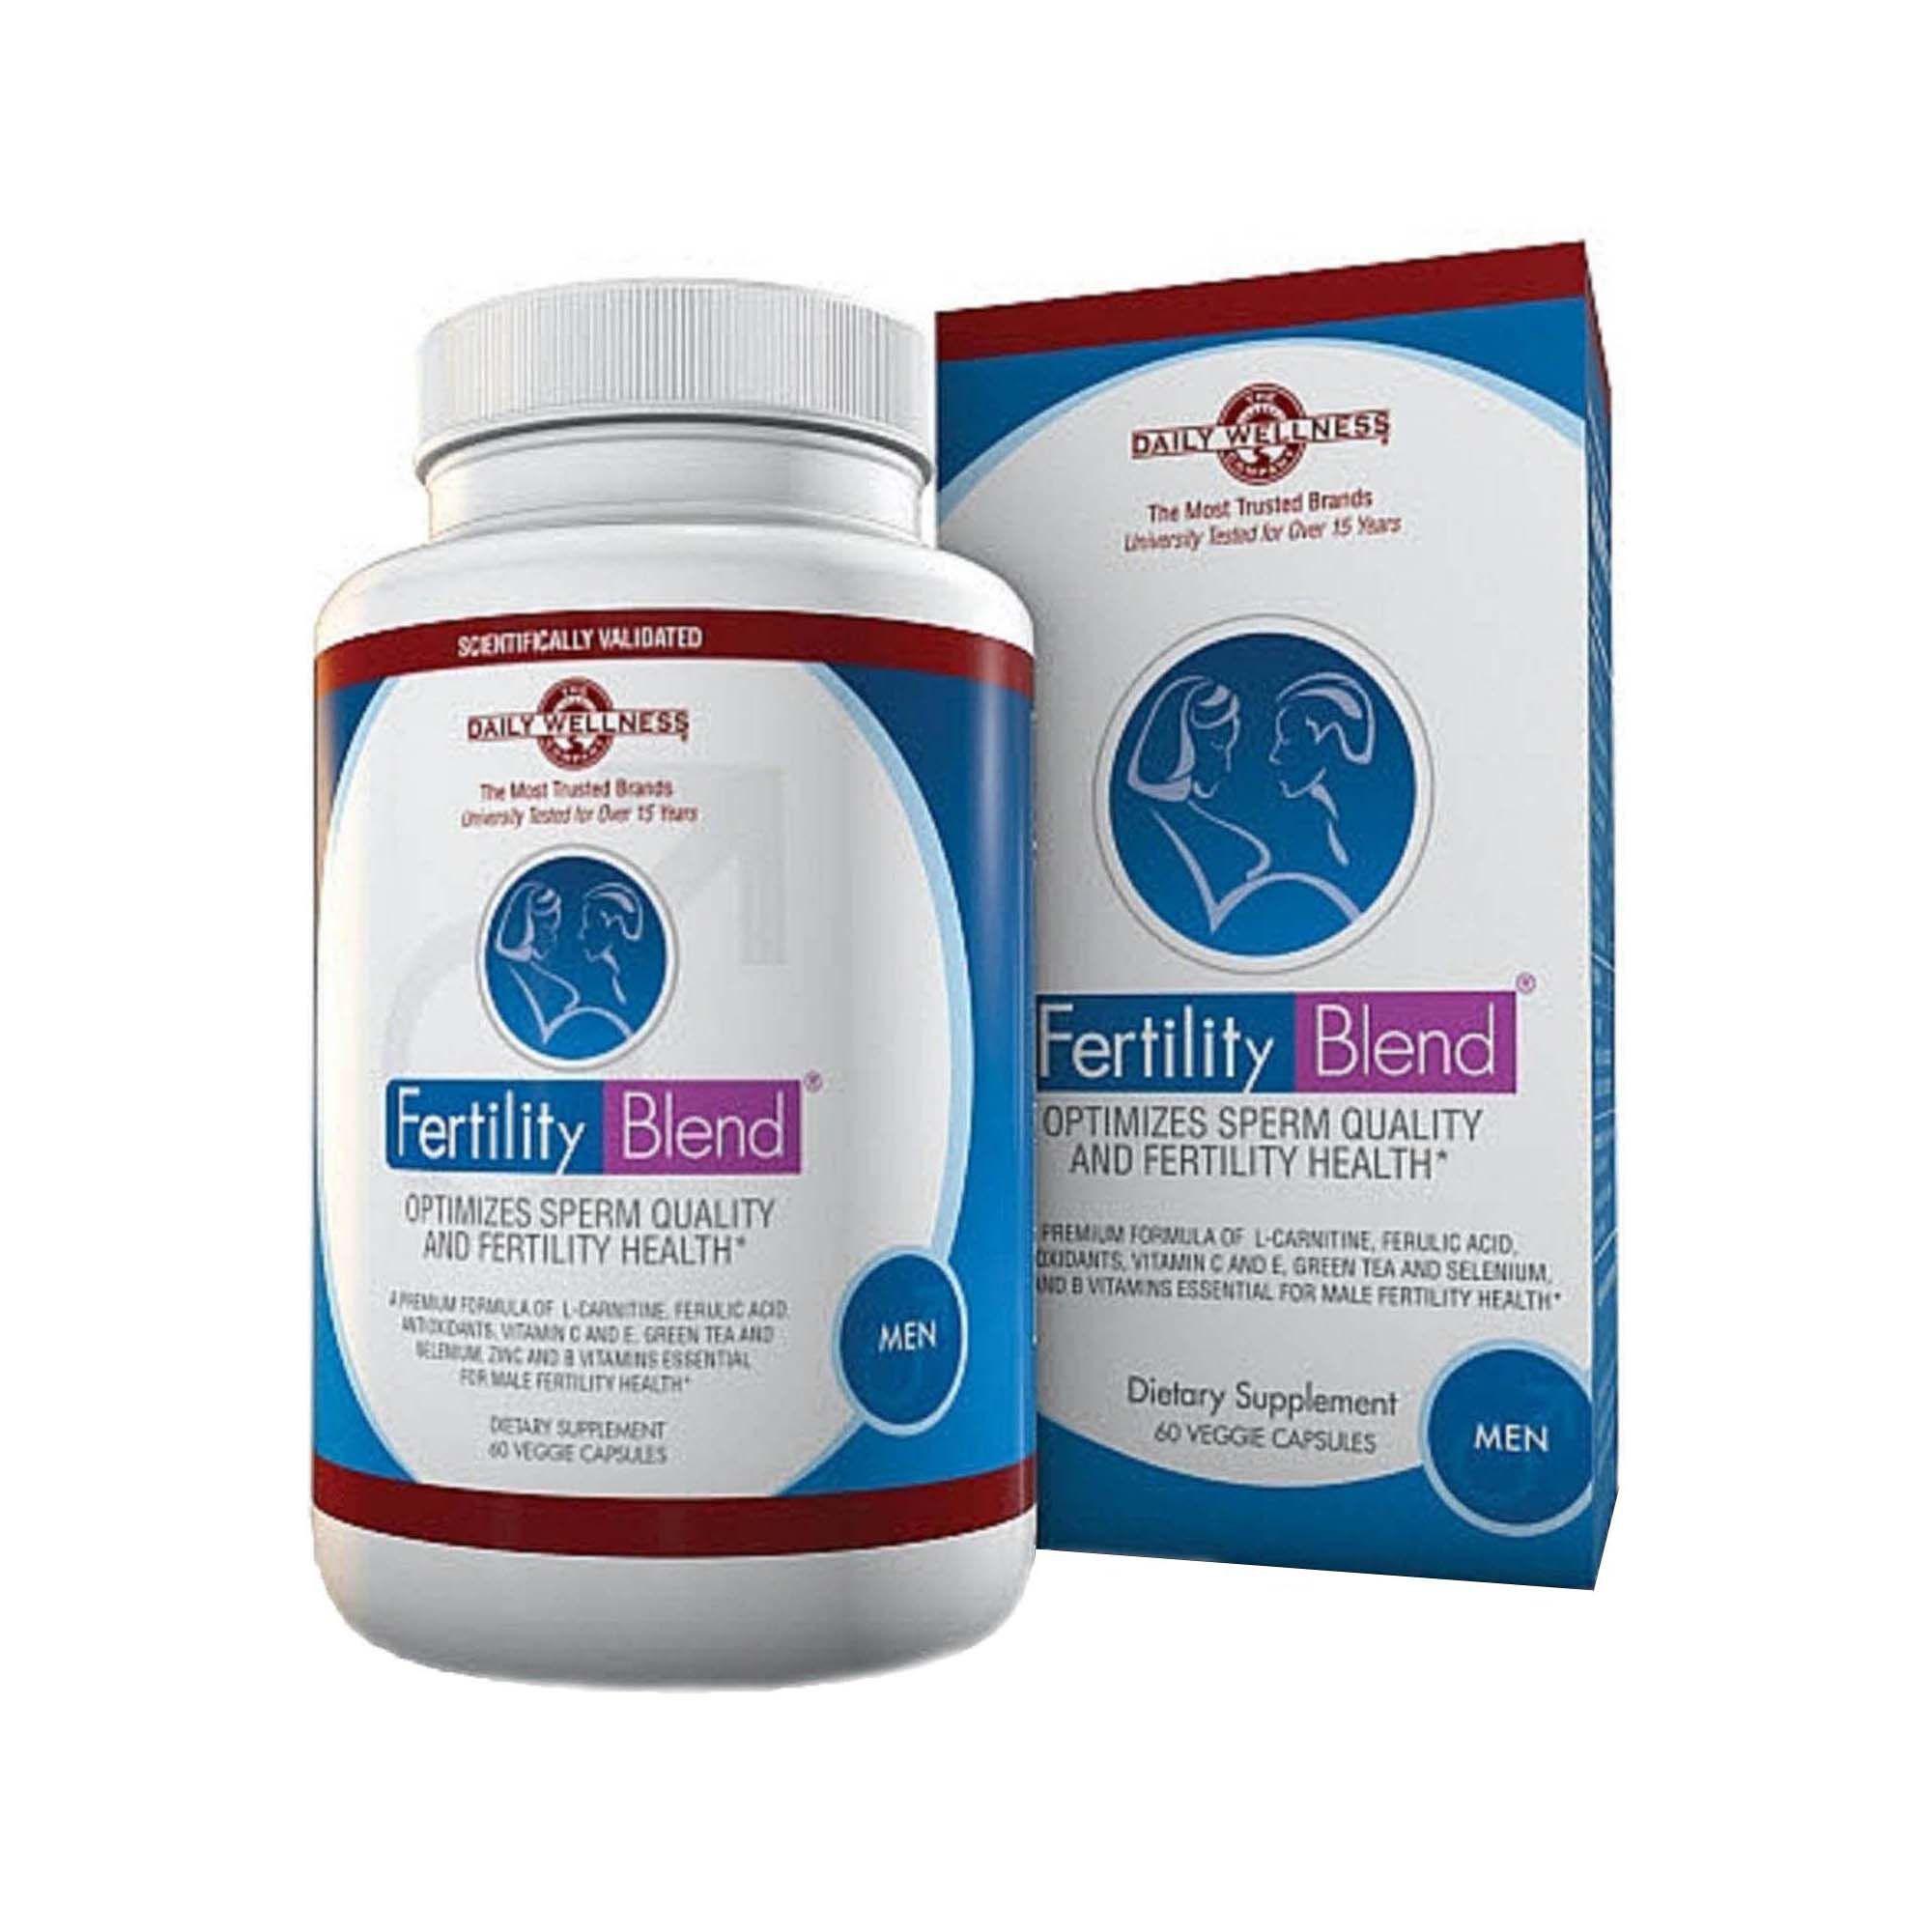 Daily Wellness Company® FertilityBlend® for Men   GNC